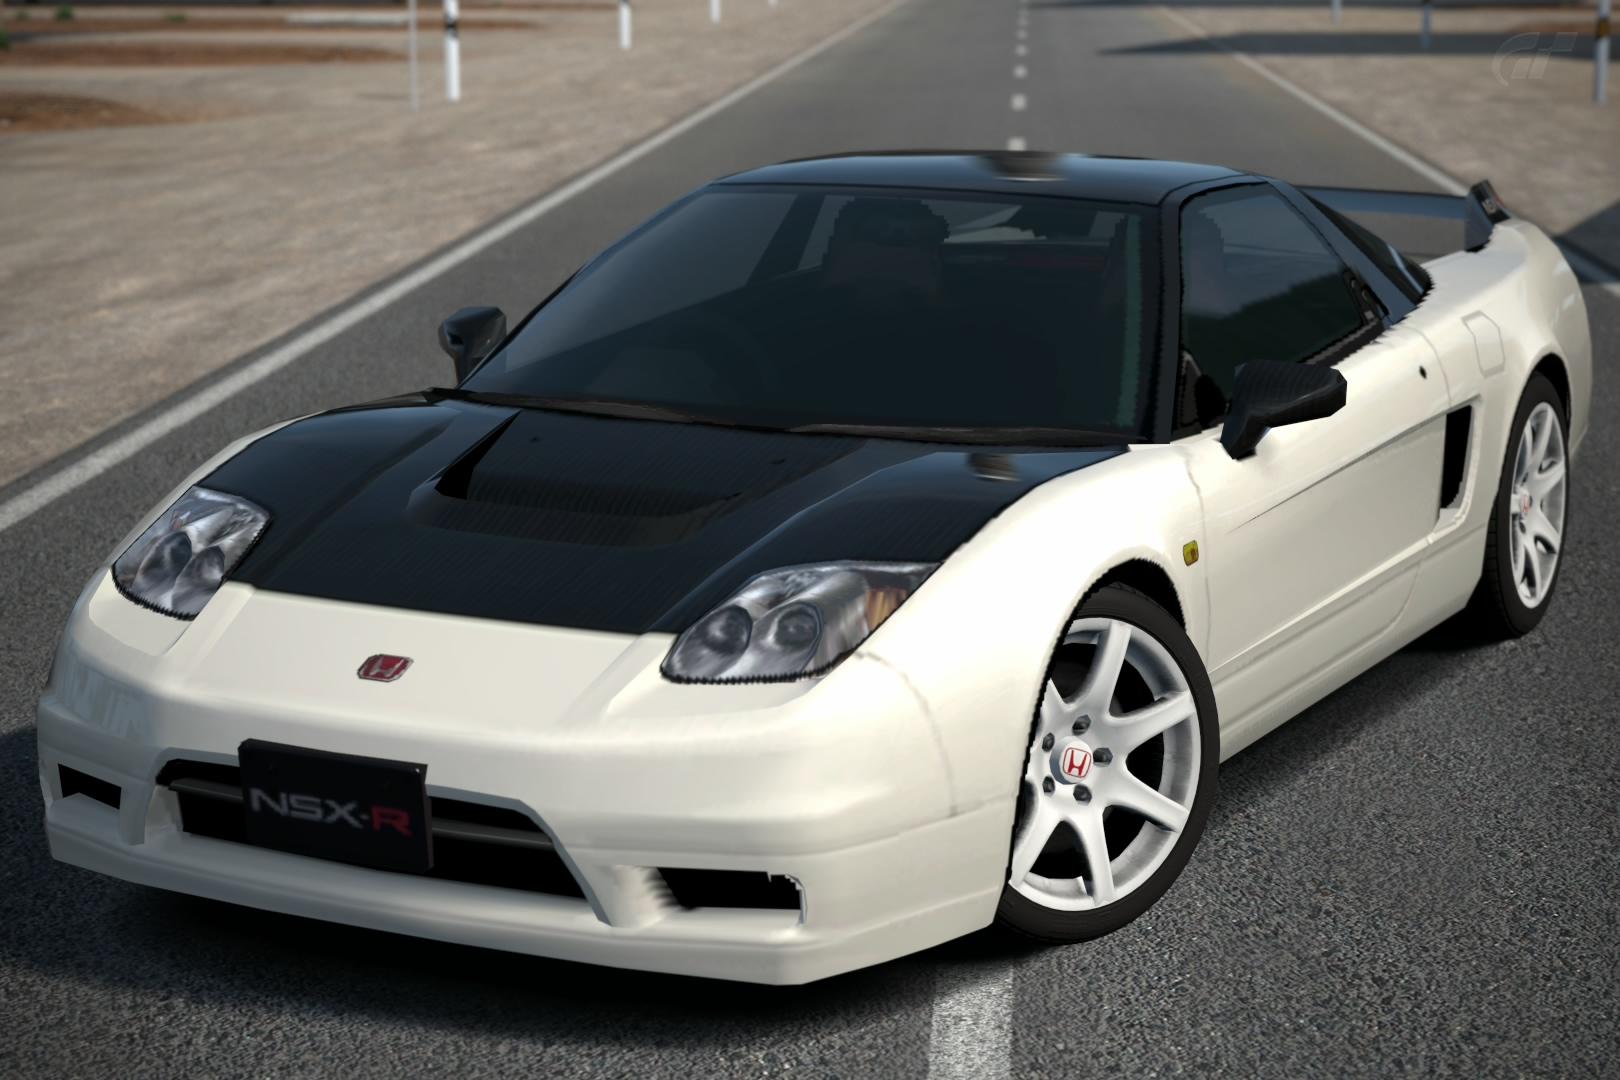 Honda Nsx R >> Honda Nsx R Concept 01 Gran Turismo Wiki Fandom Powered By Wikia